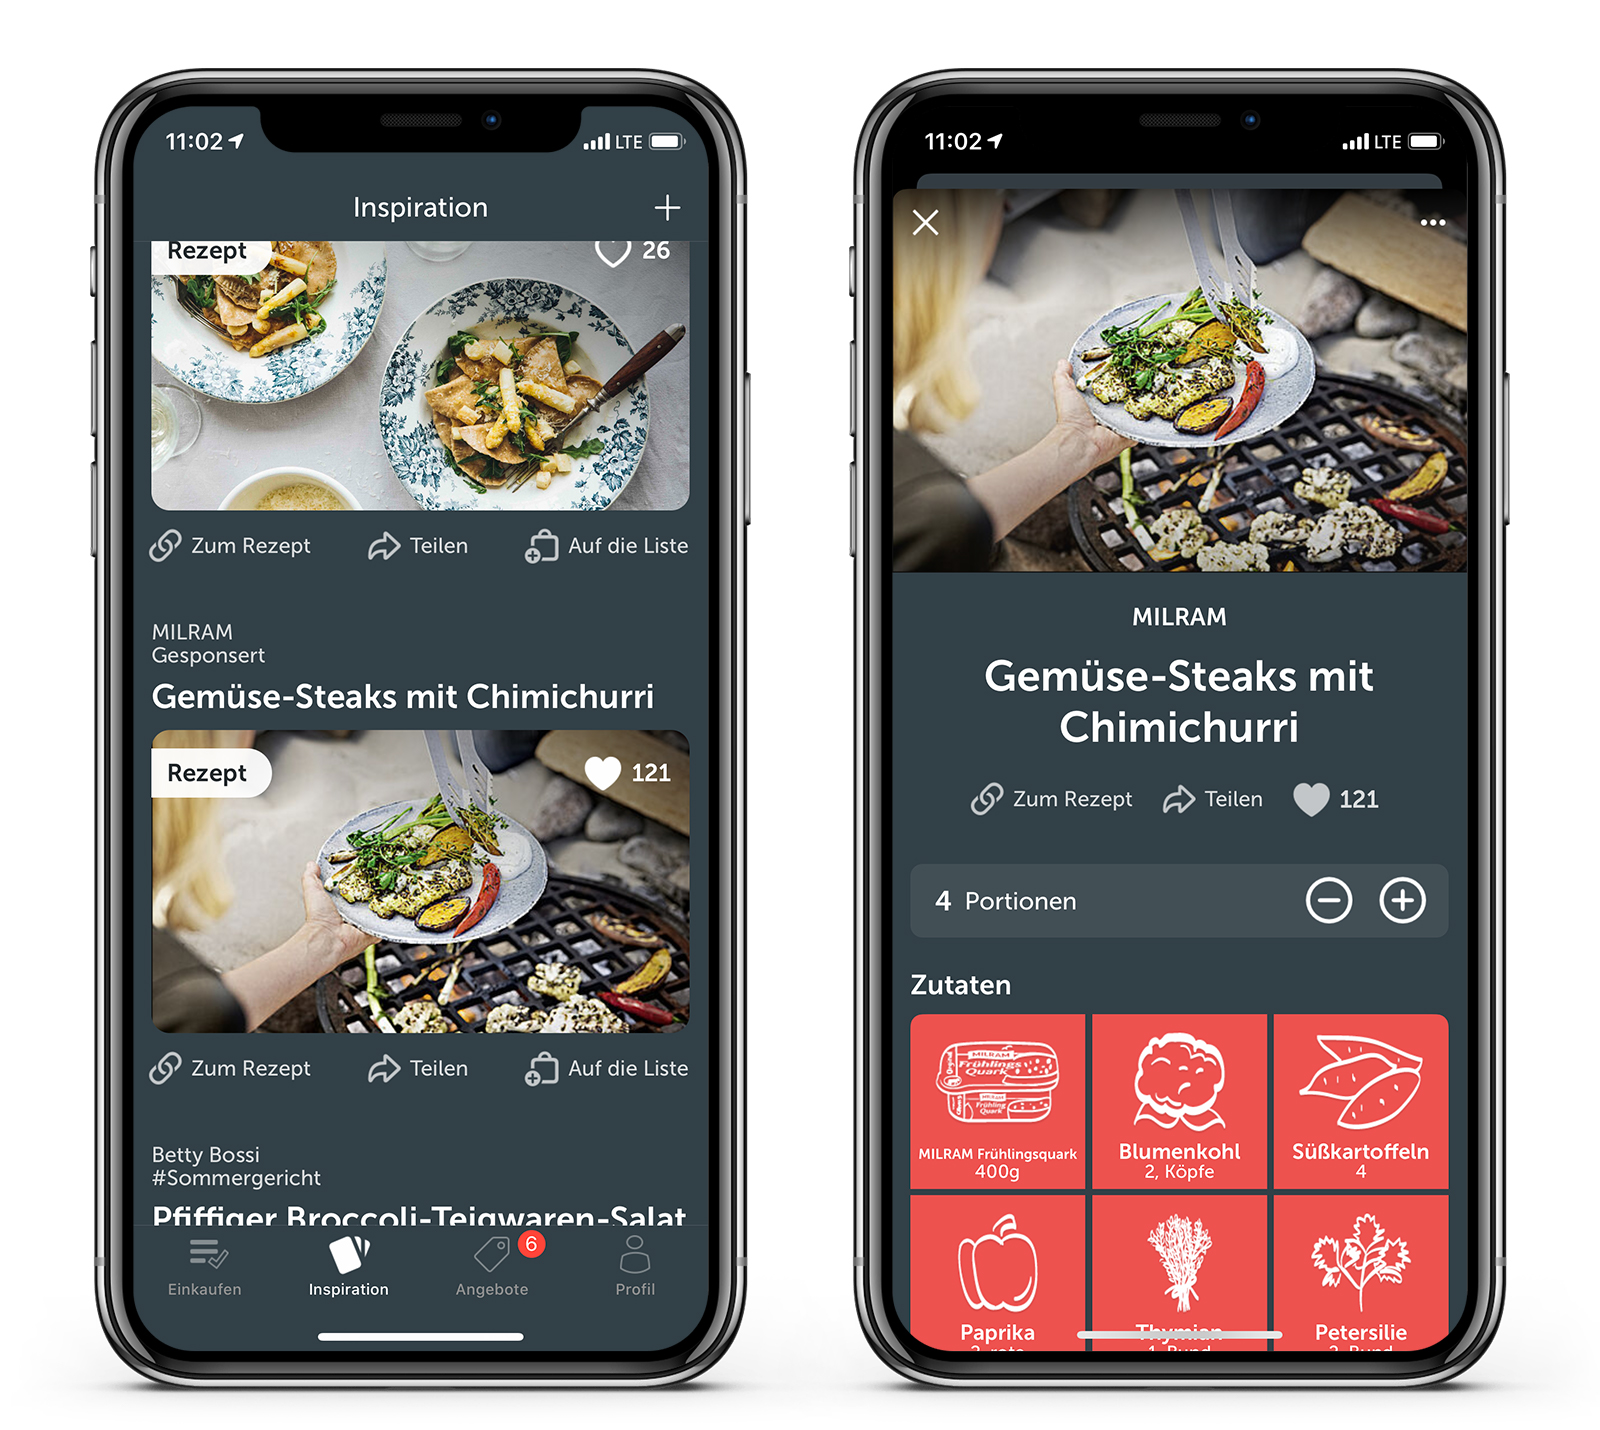 advertising-bring-app-sponsored-recipe